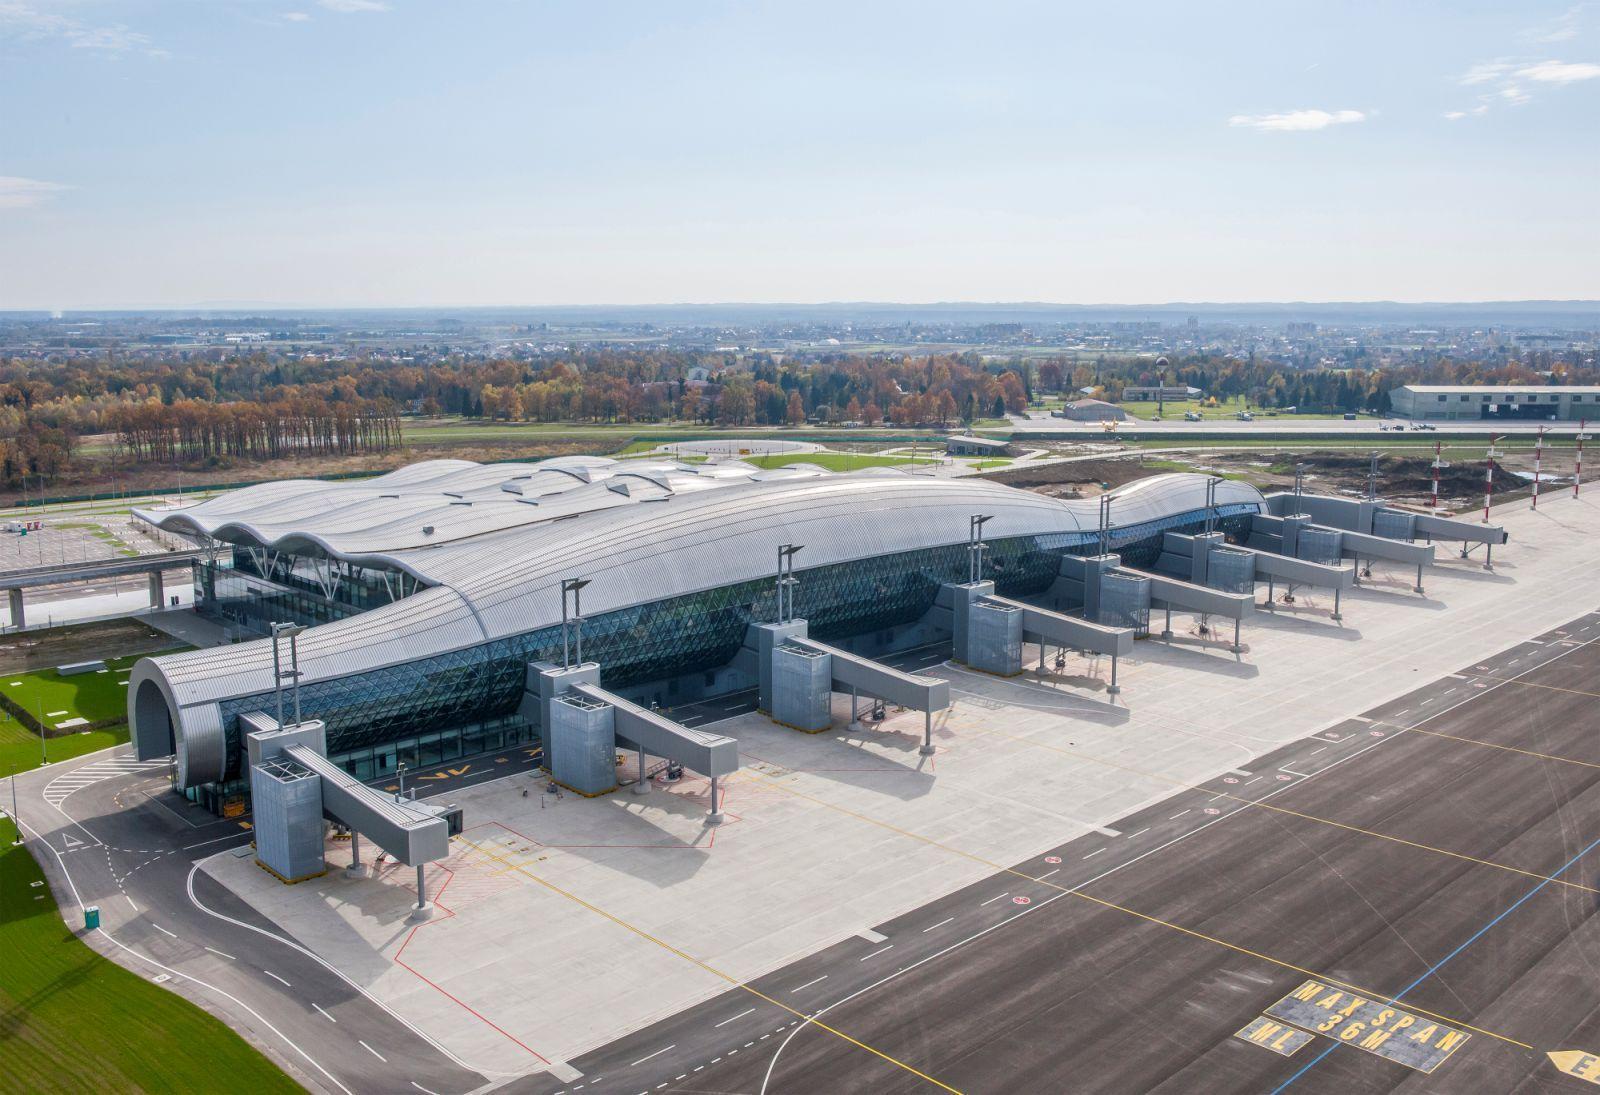 New Passenger Terminal Zagreb Airport Airport Design